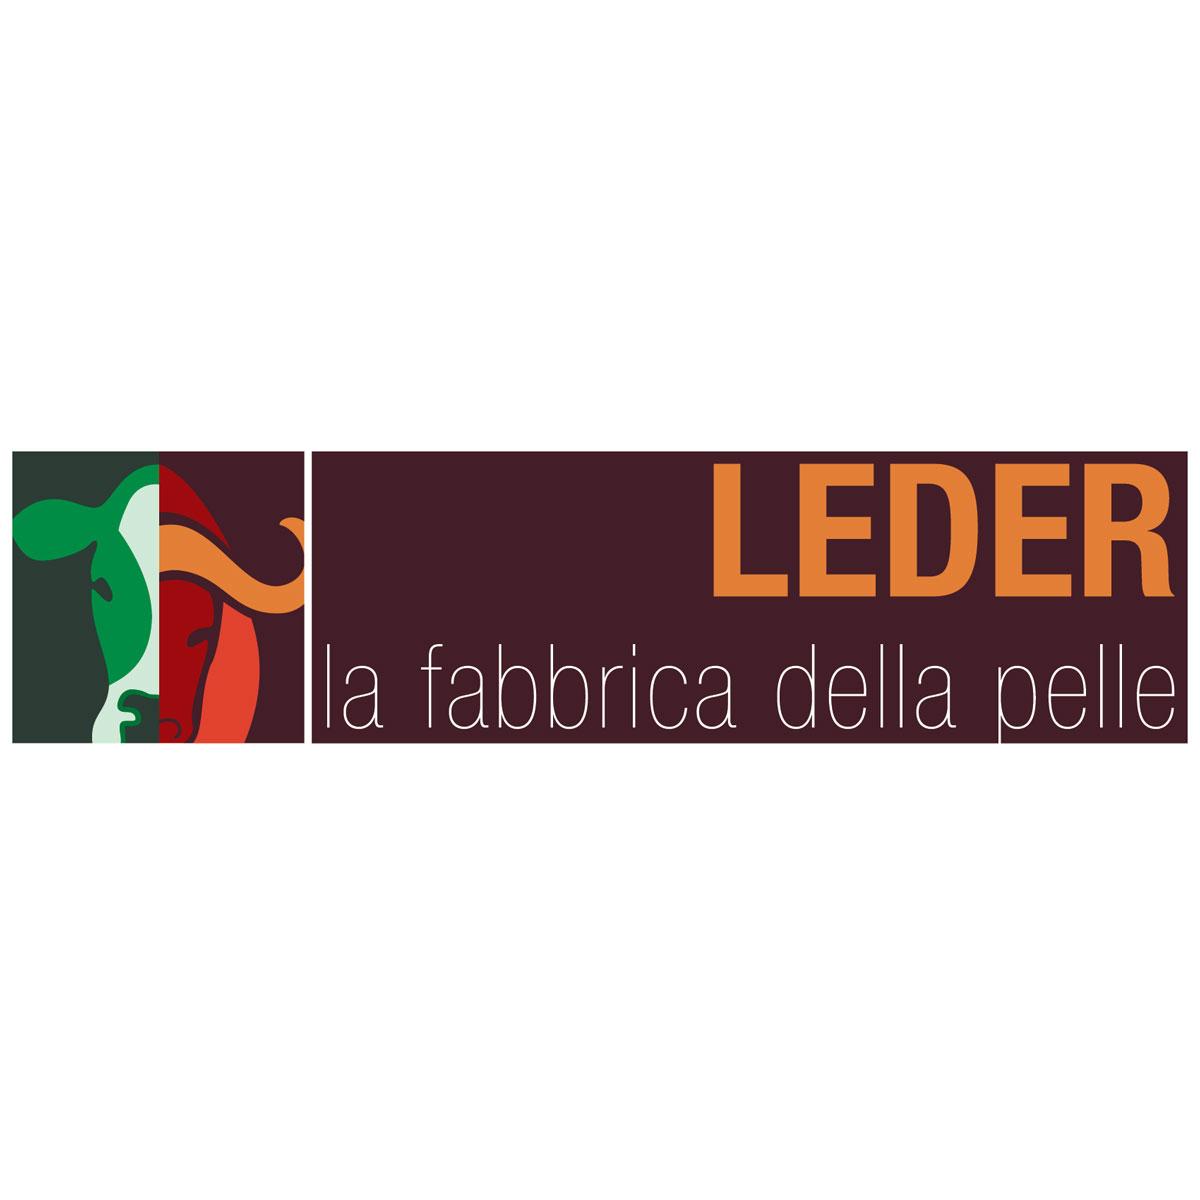 LEDER Logo & Communication